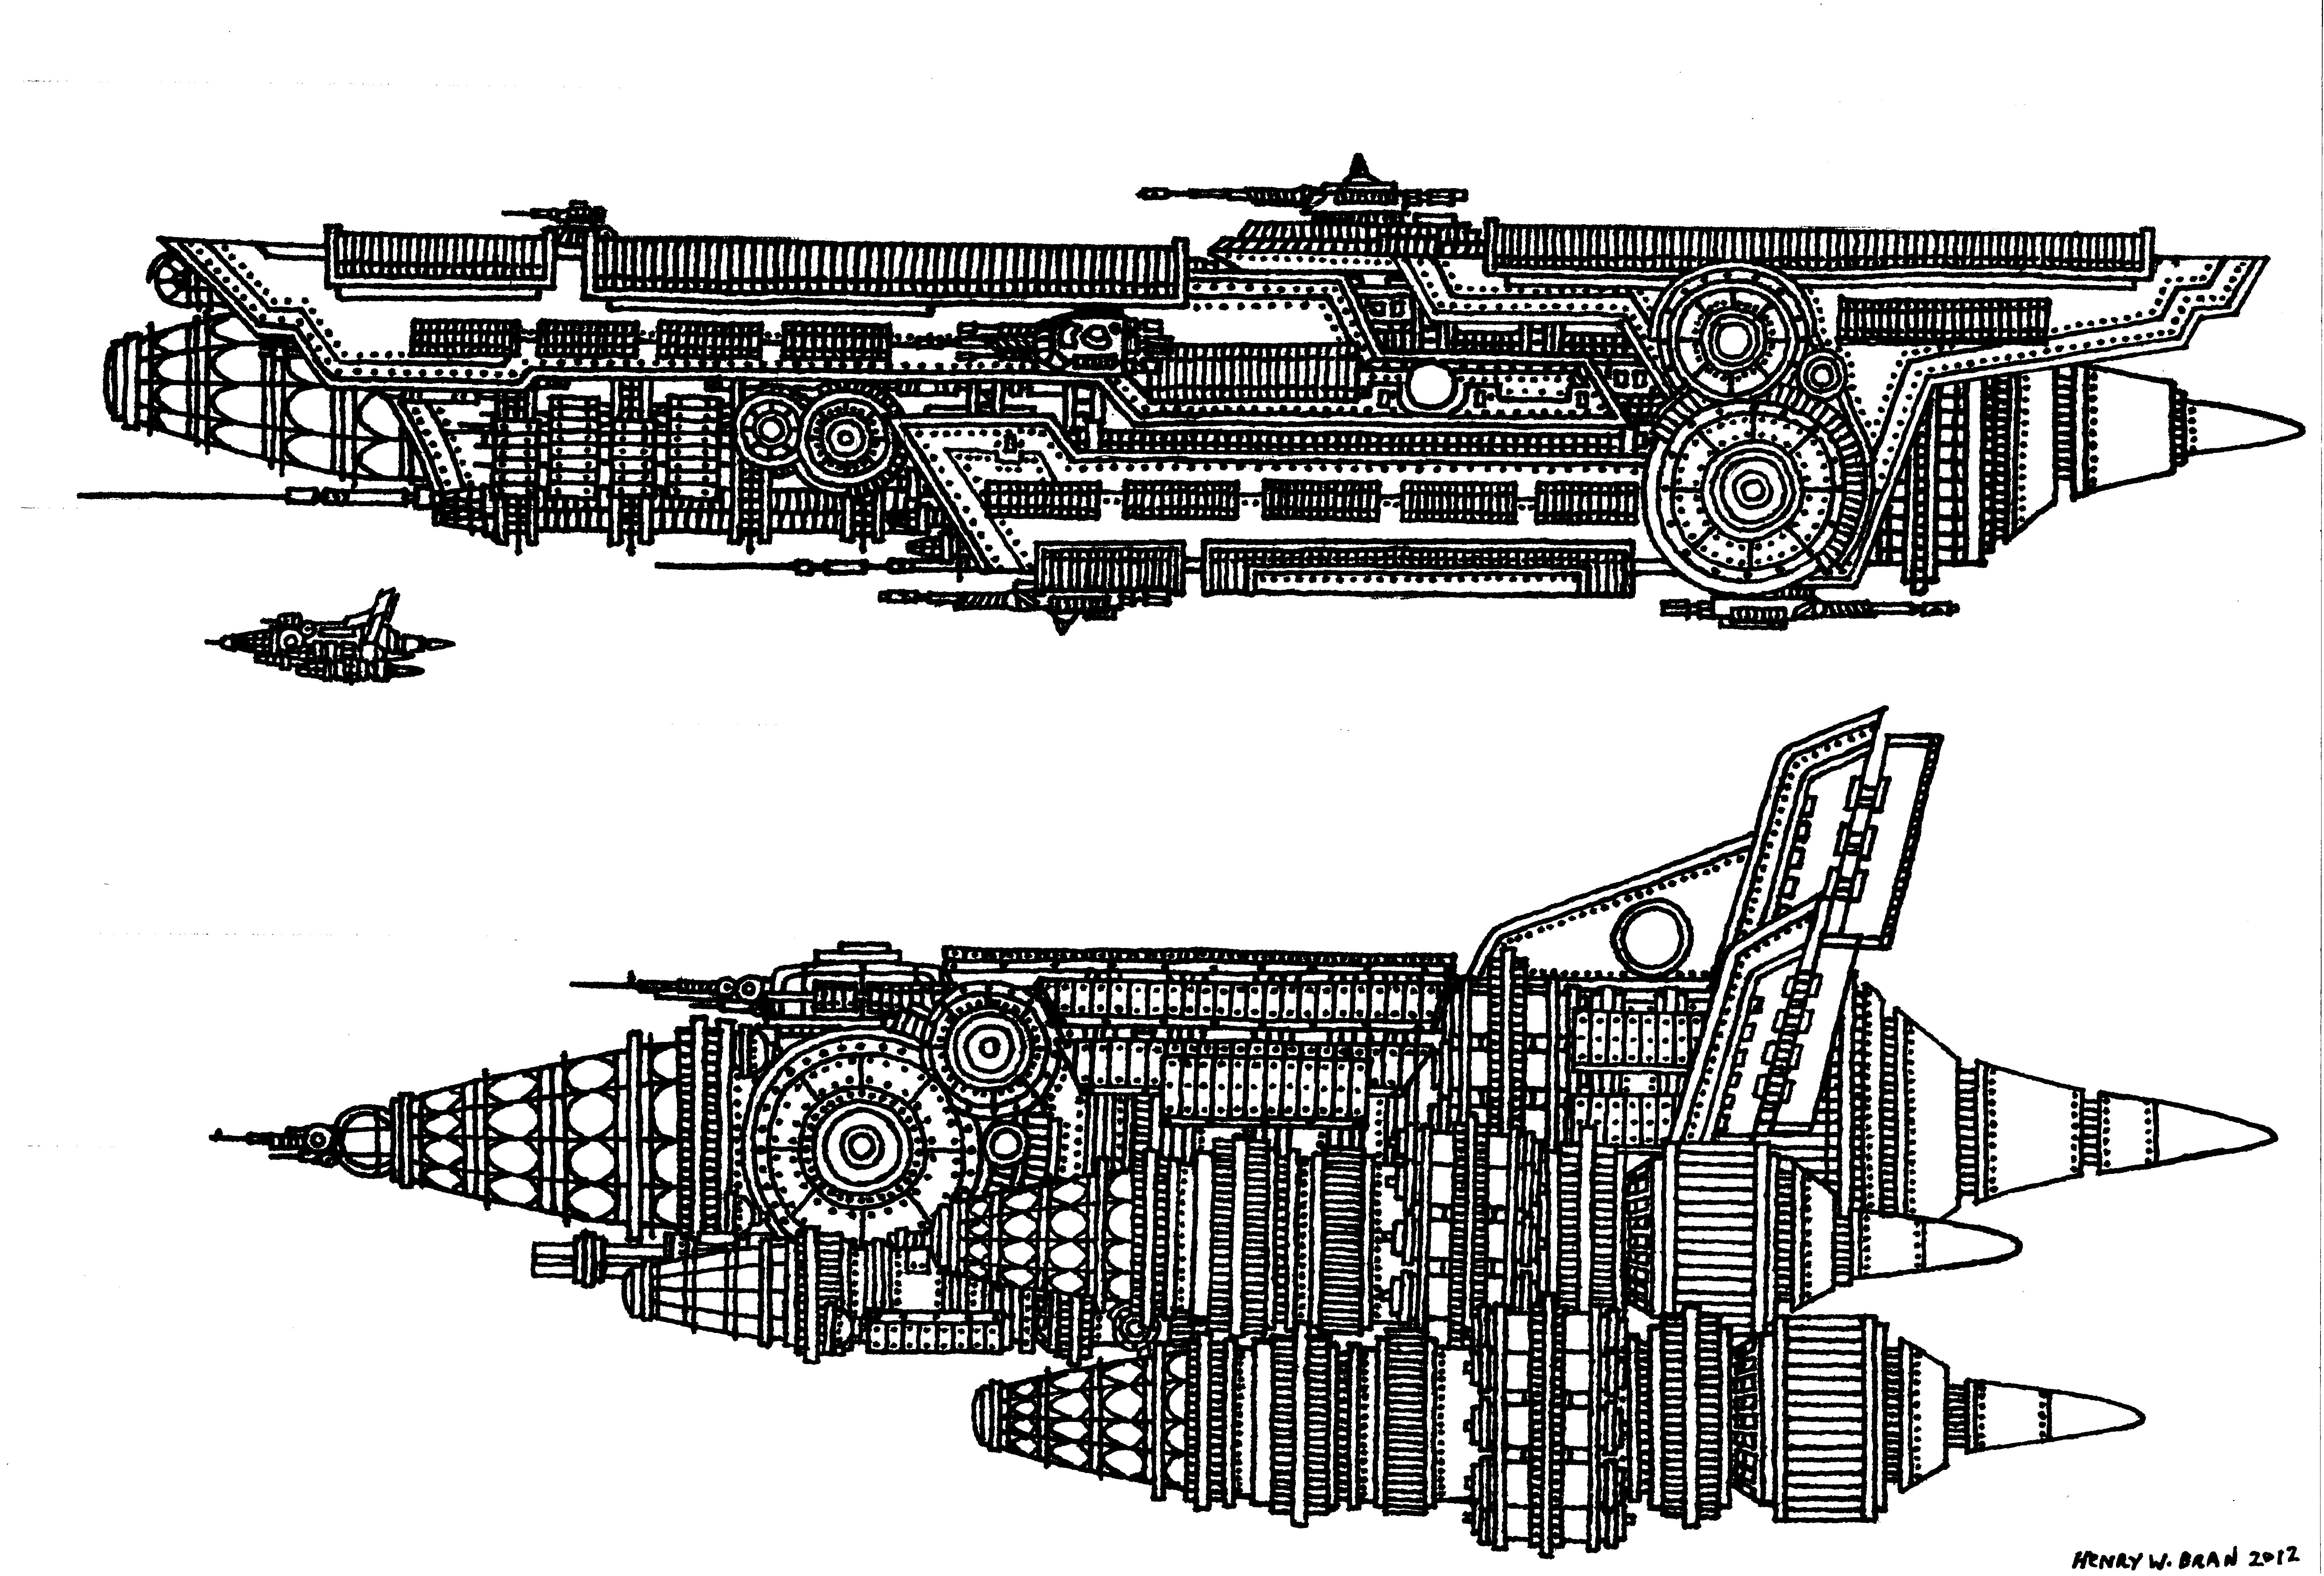 Tenebrae Imperium Military cruiser and bomber by TenebraesRising